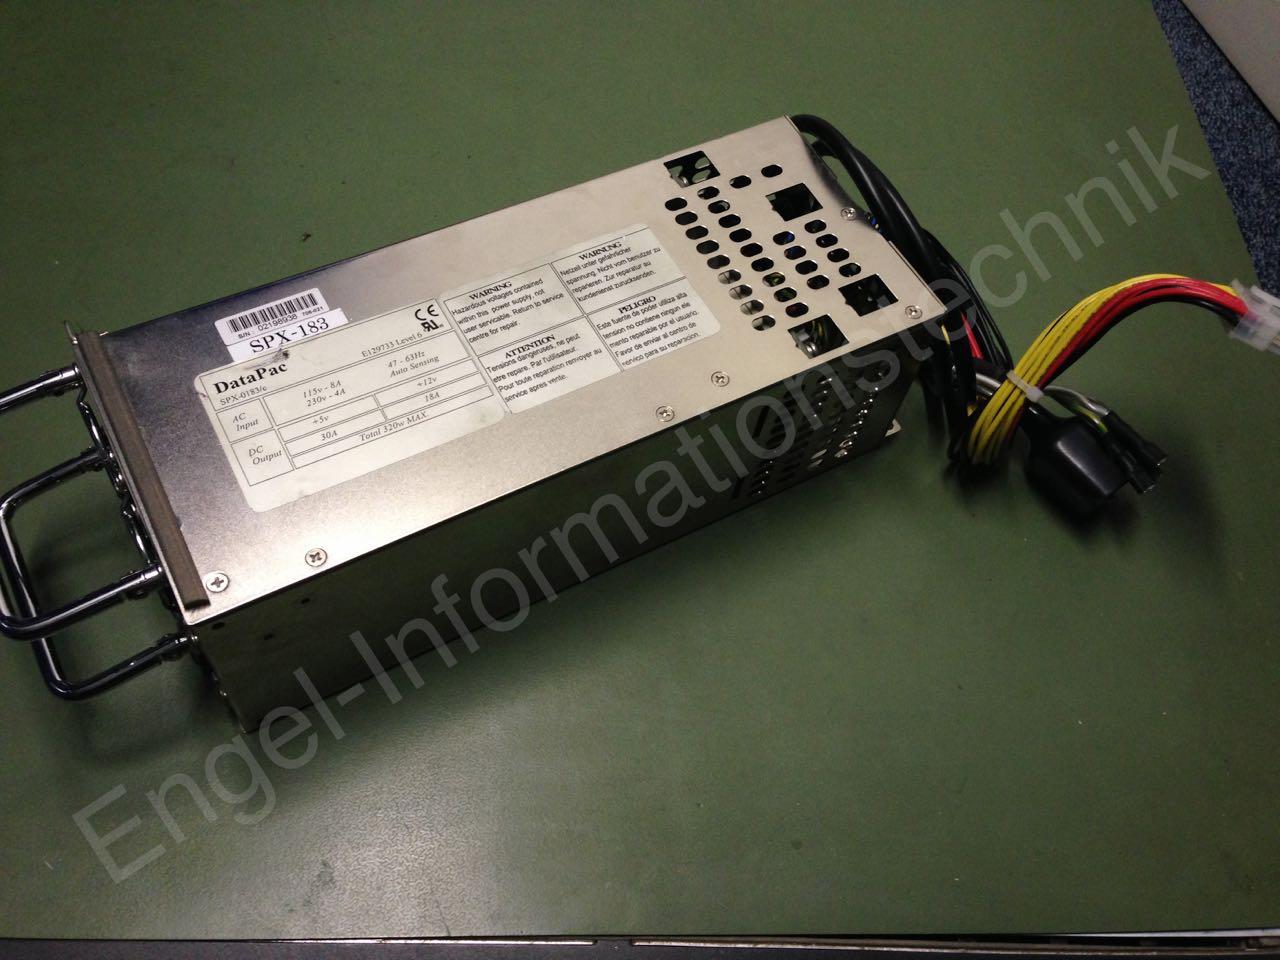 DataPac SPX-183